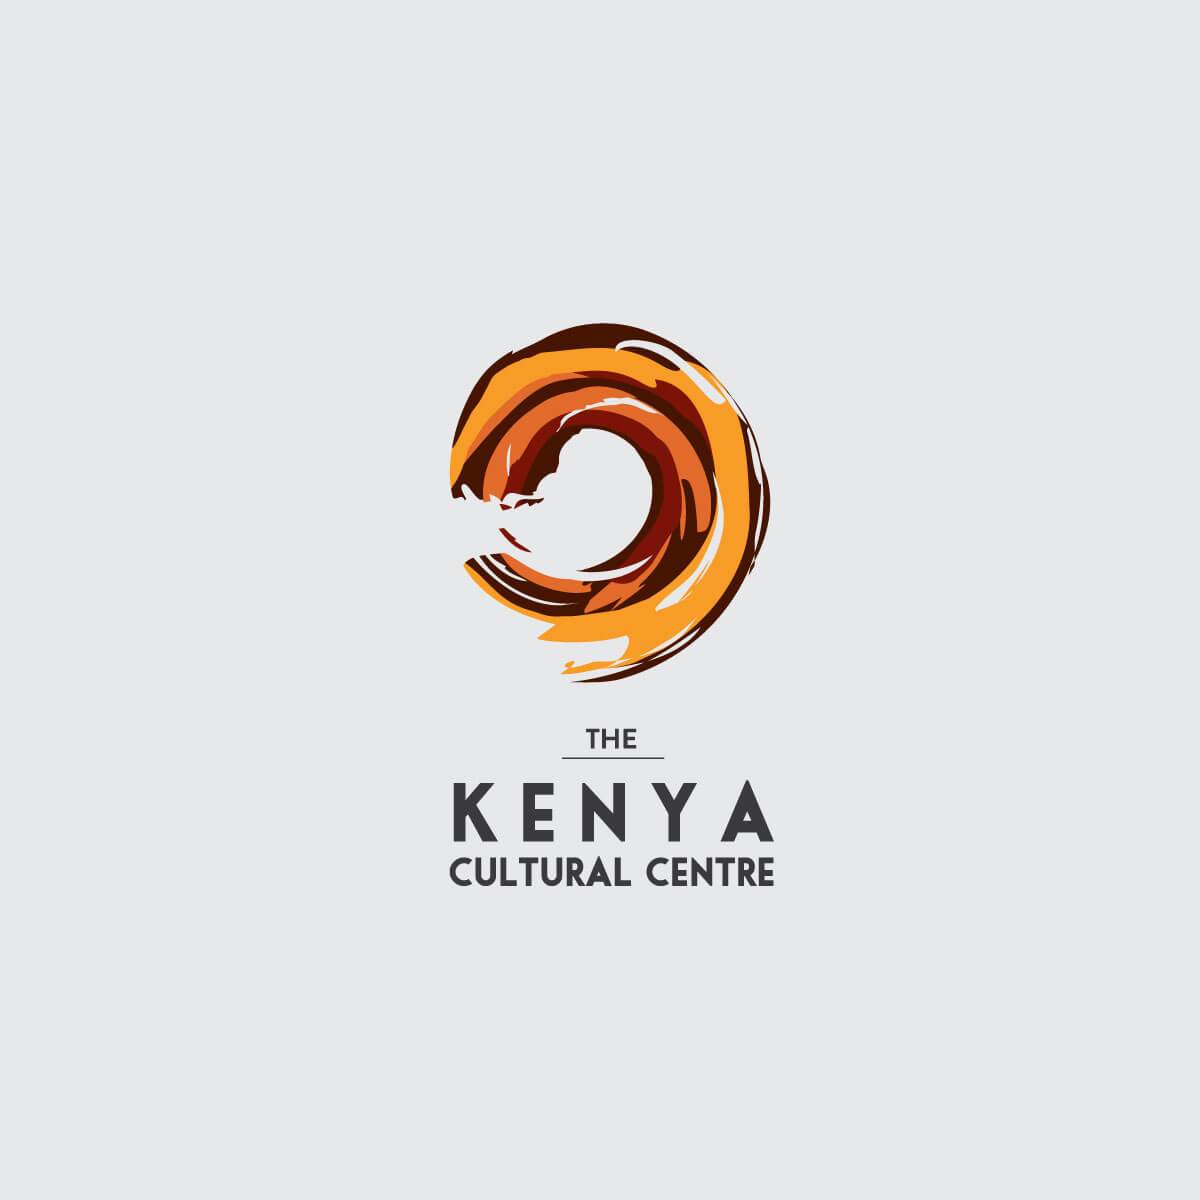 Kenya Cultural Centre Identity Design